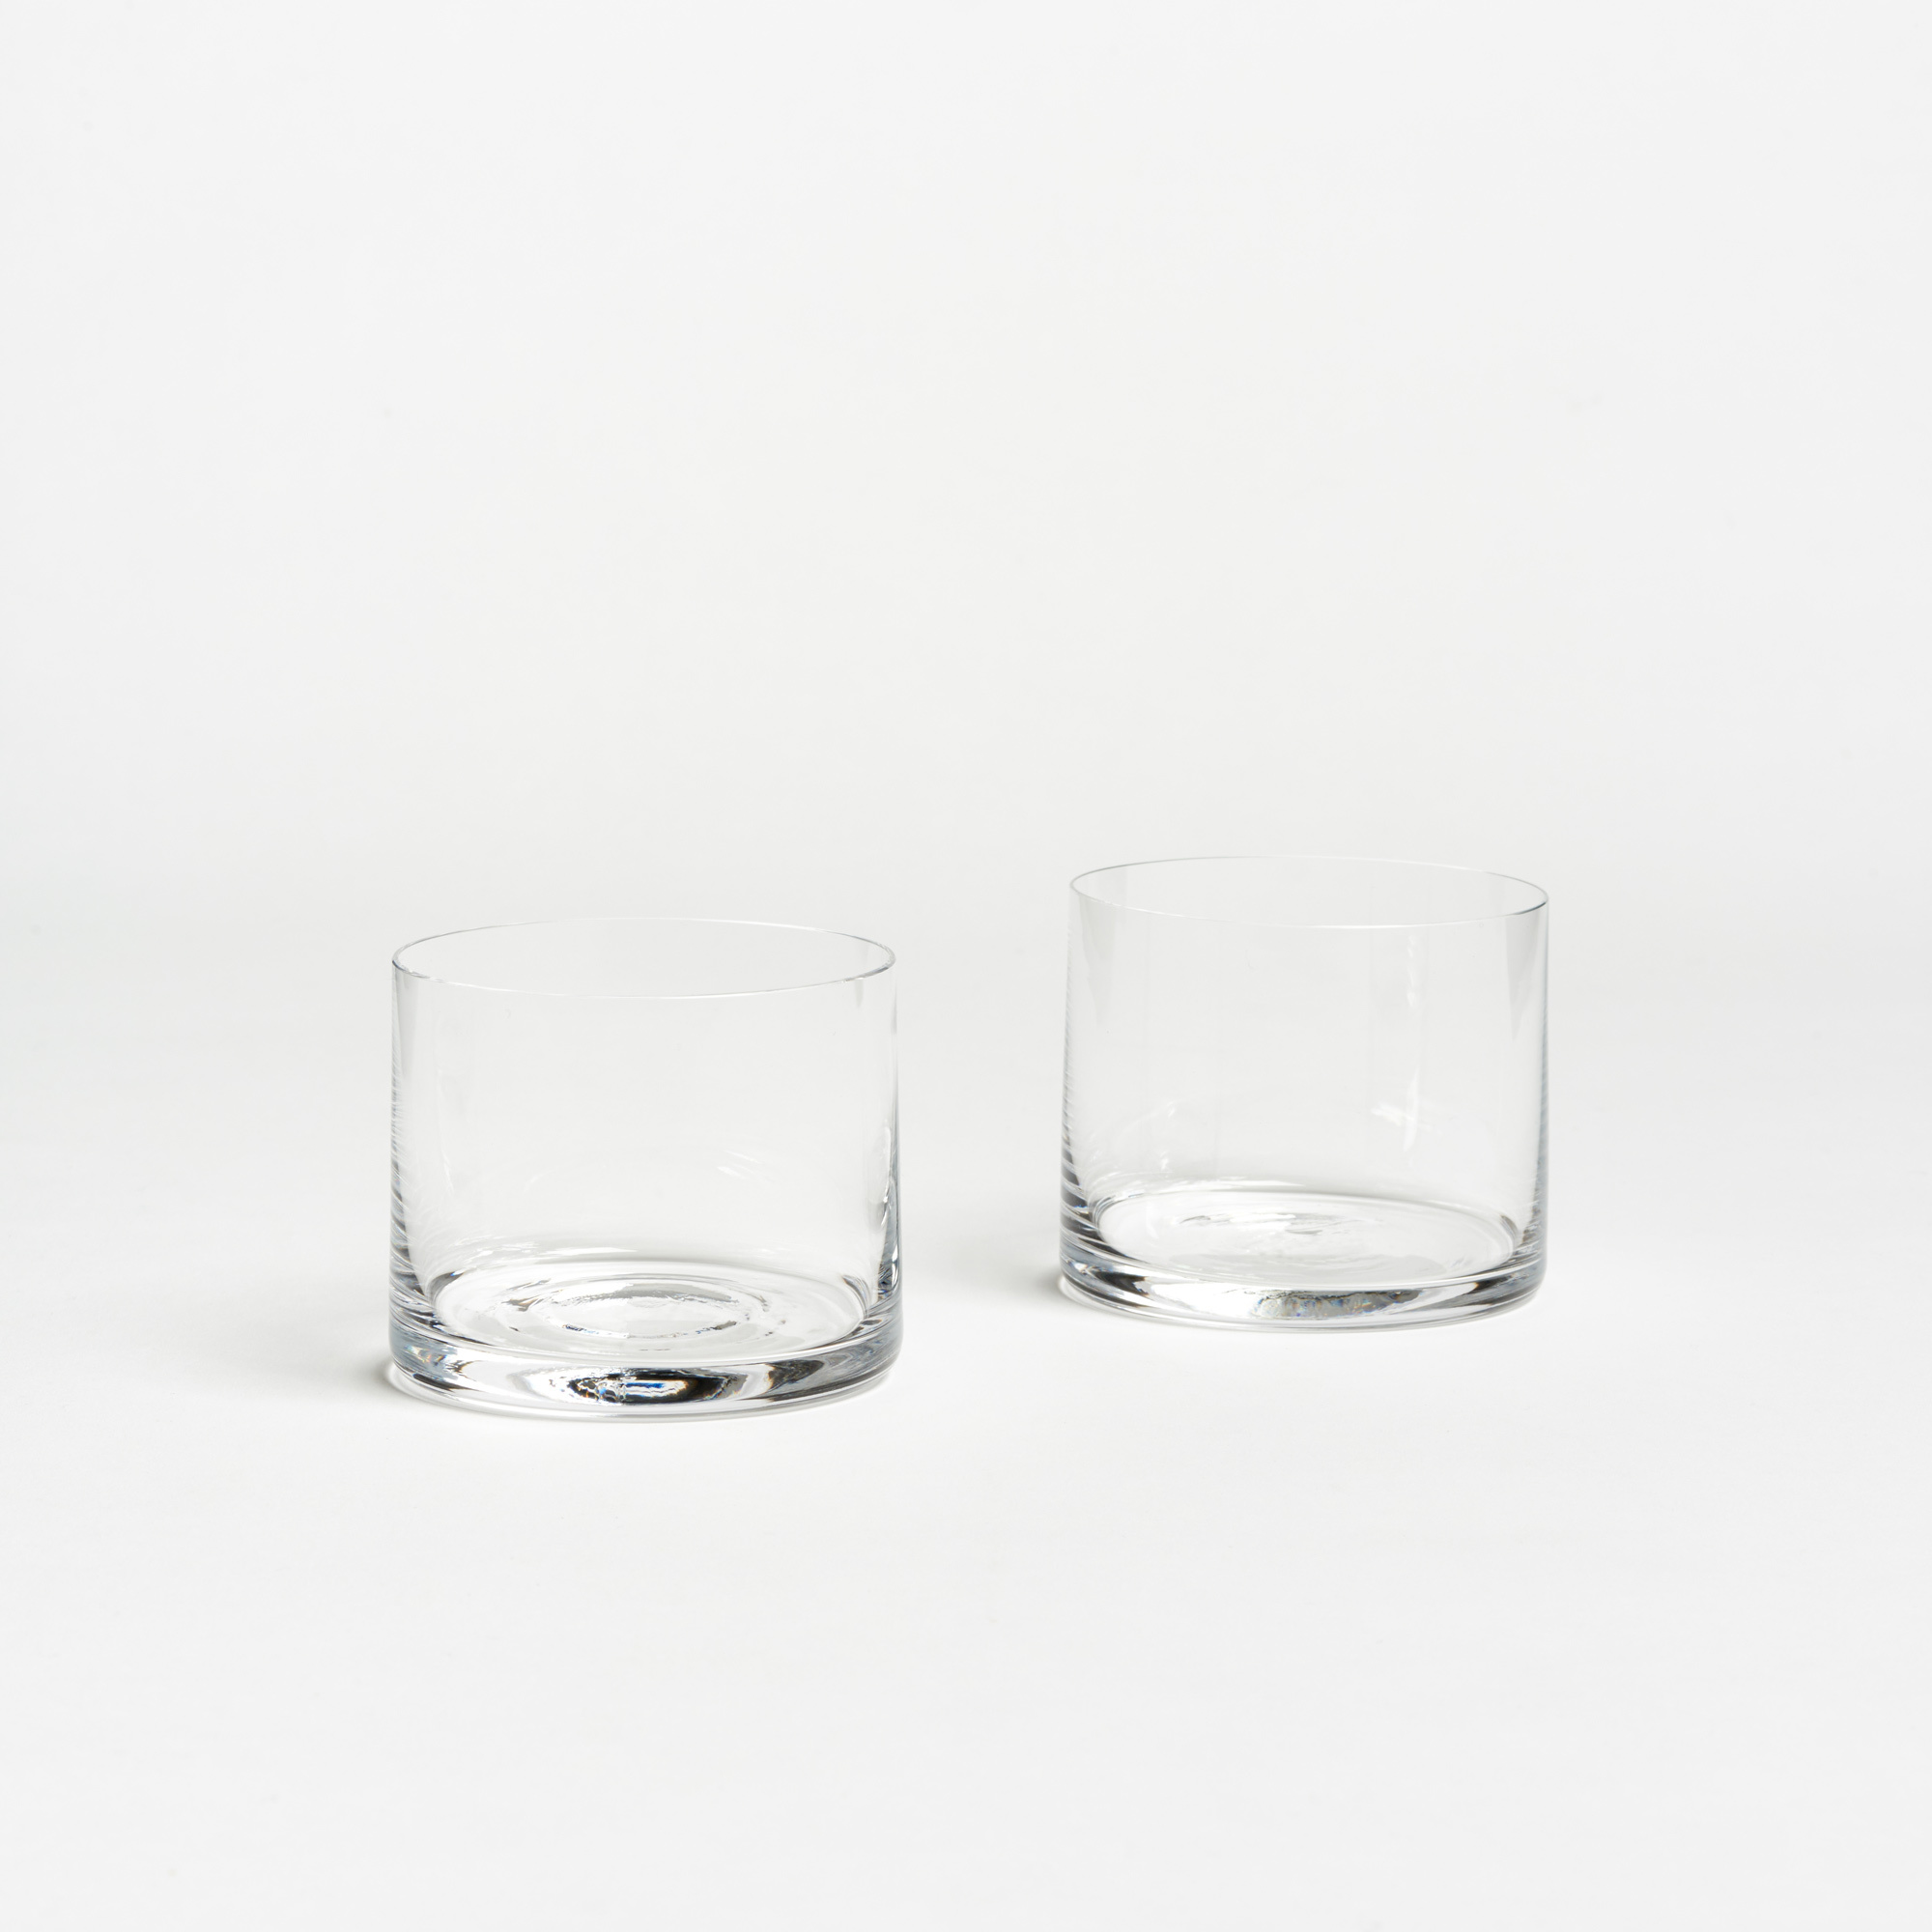 pair of simple crystal rocks glasses - Rocks Glasses